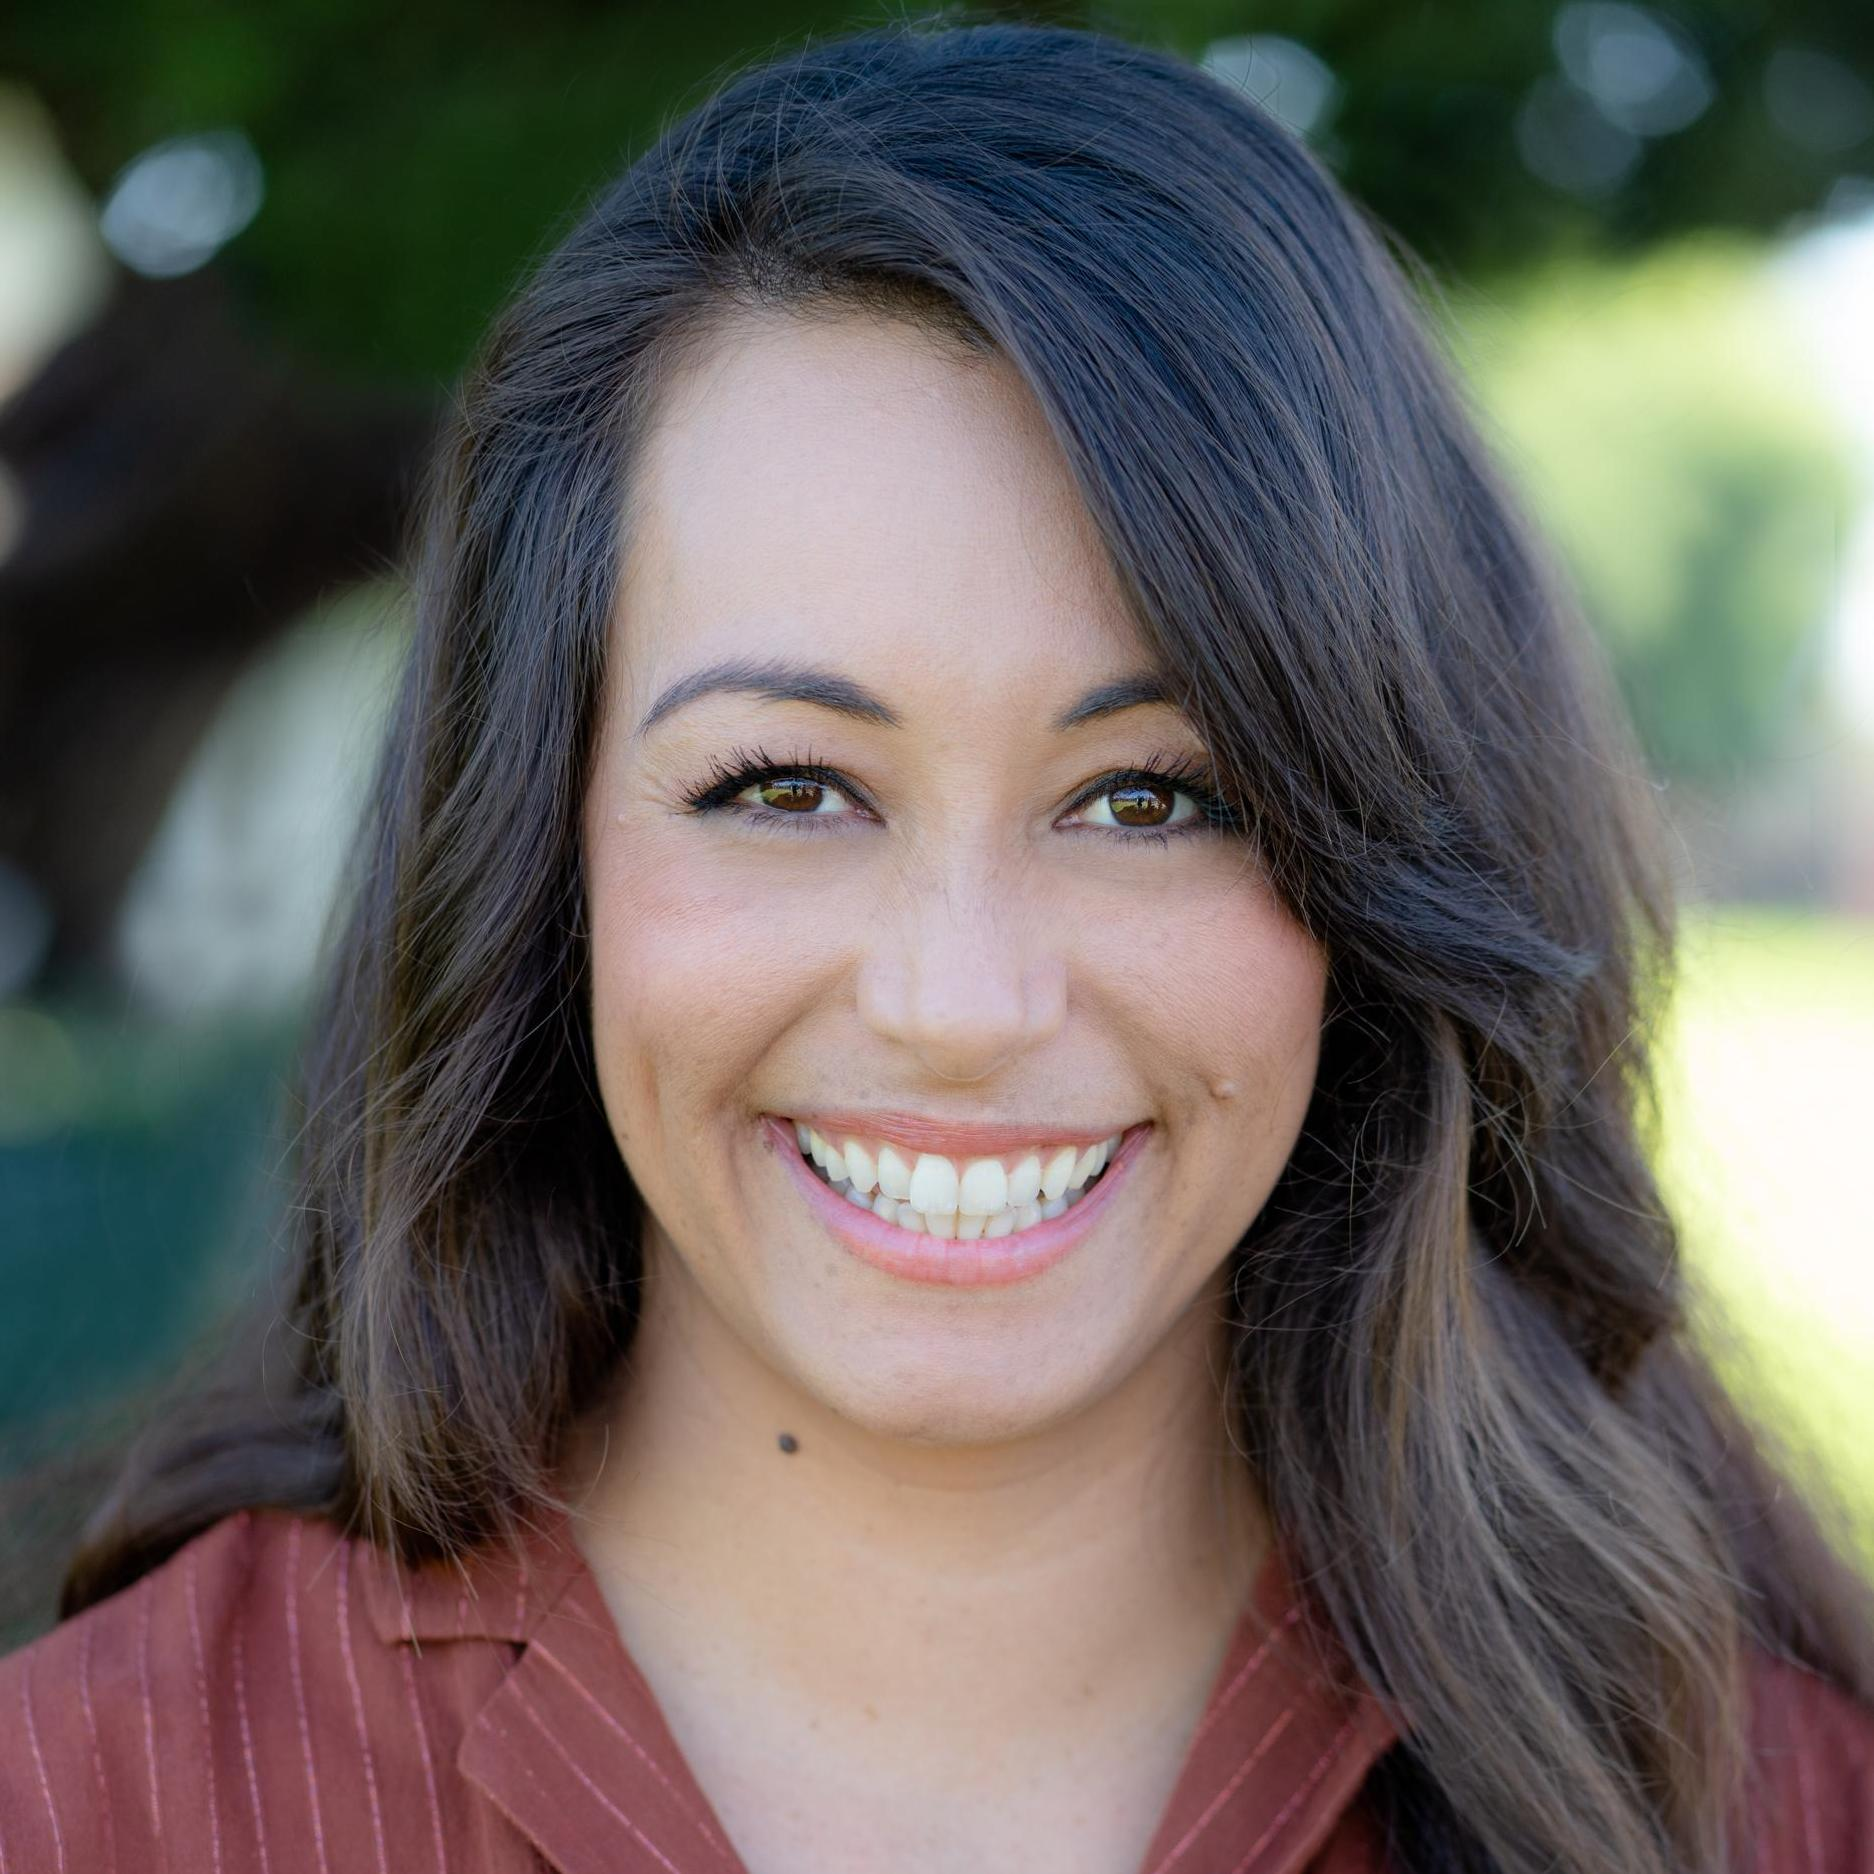 Lissa *Slay's Profile Photo